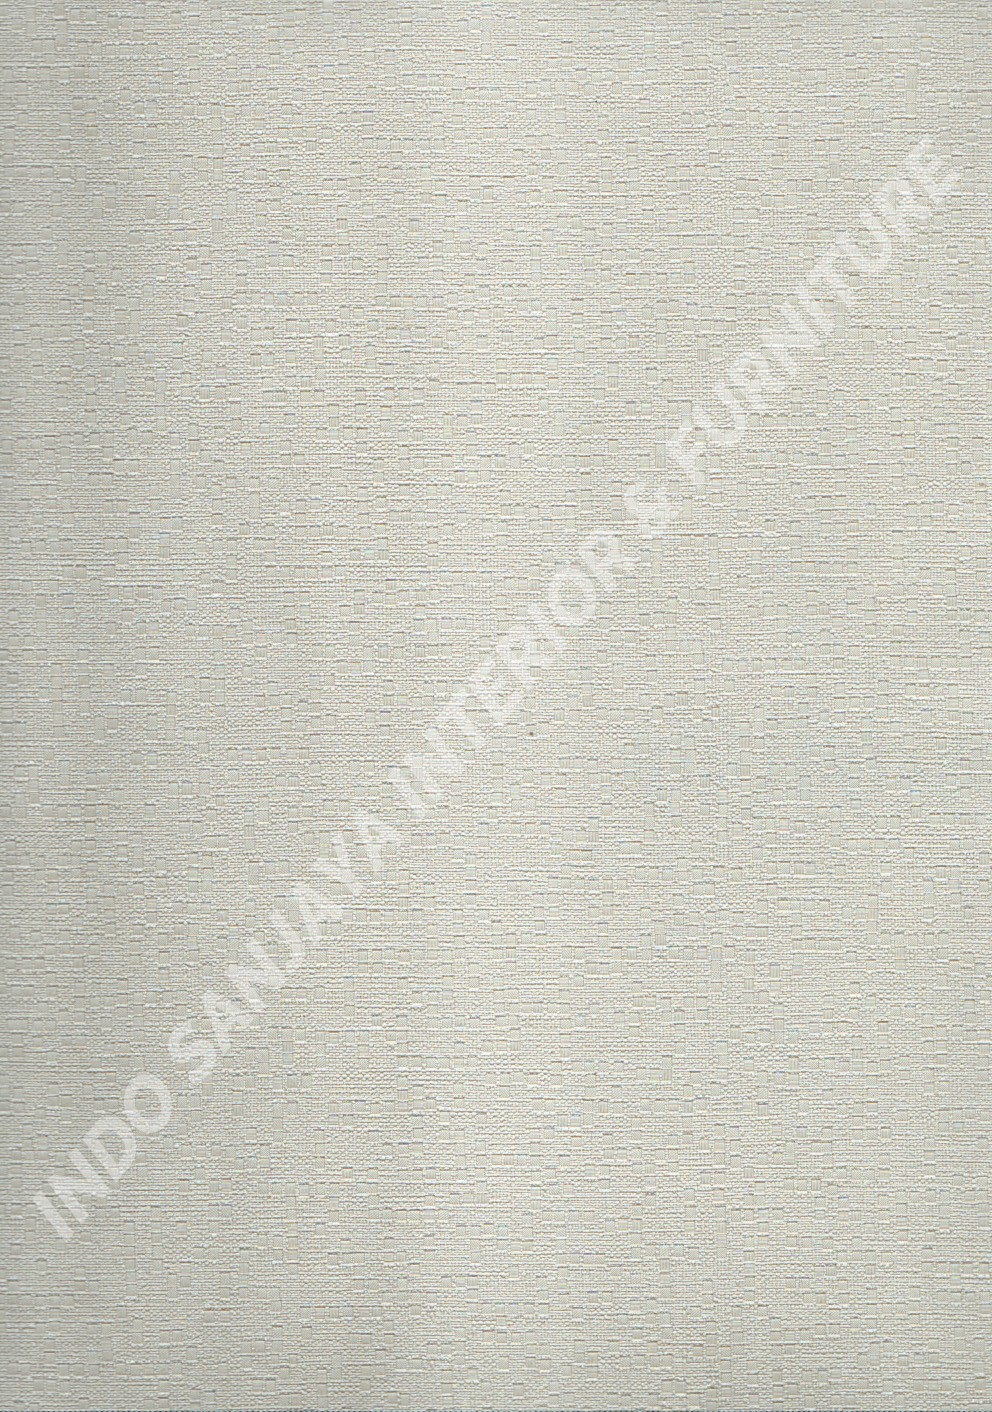 wallpaper MOKO:3064 corak Minimalis / Polos warna Abu-Abu